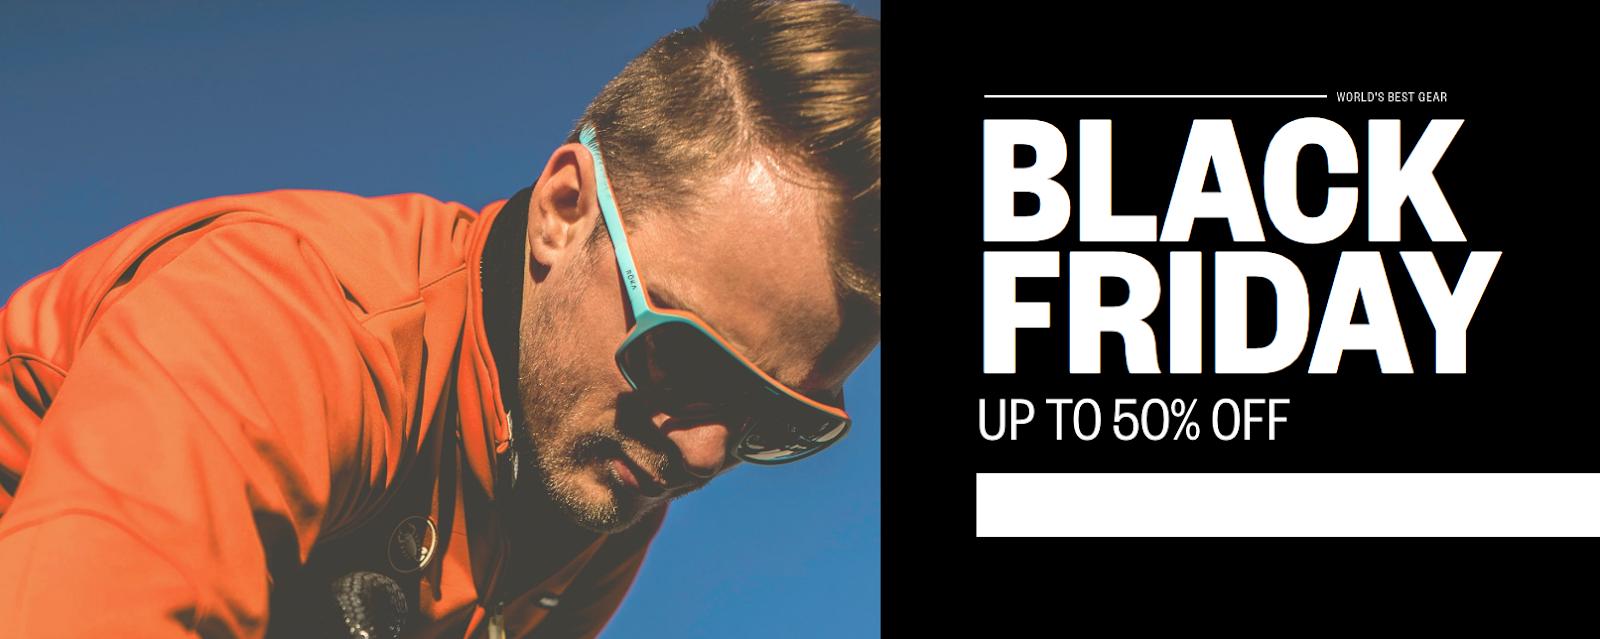 ROKA Black Friday Sale